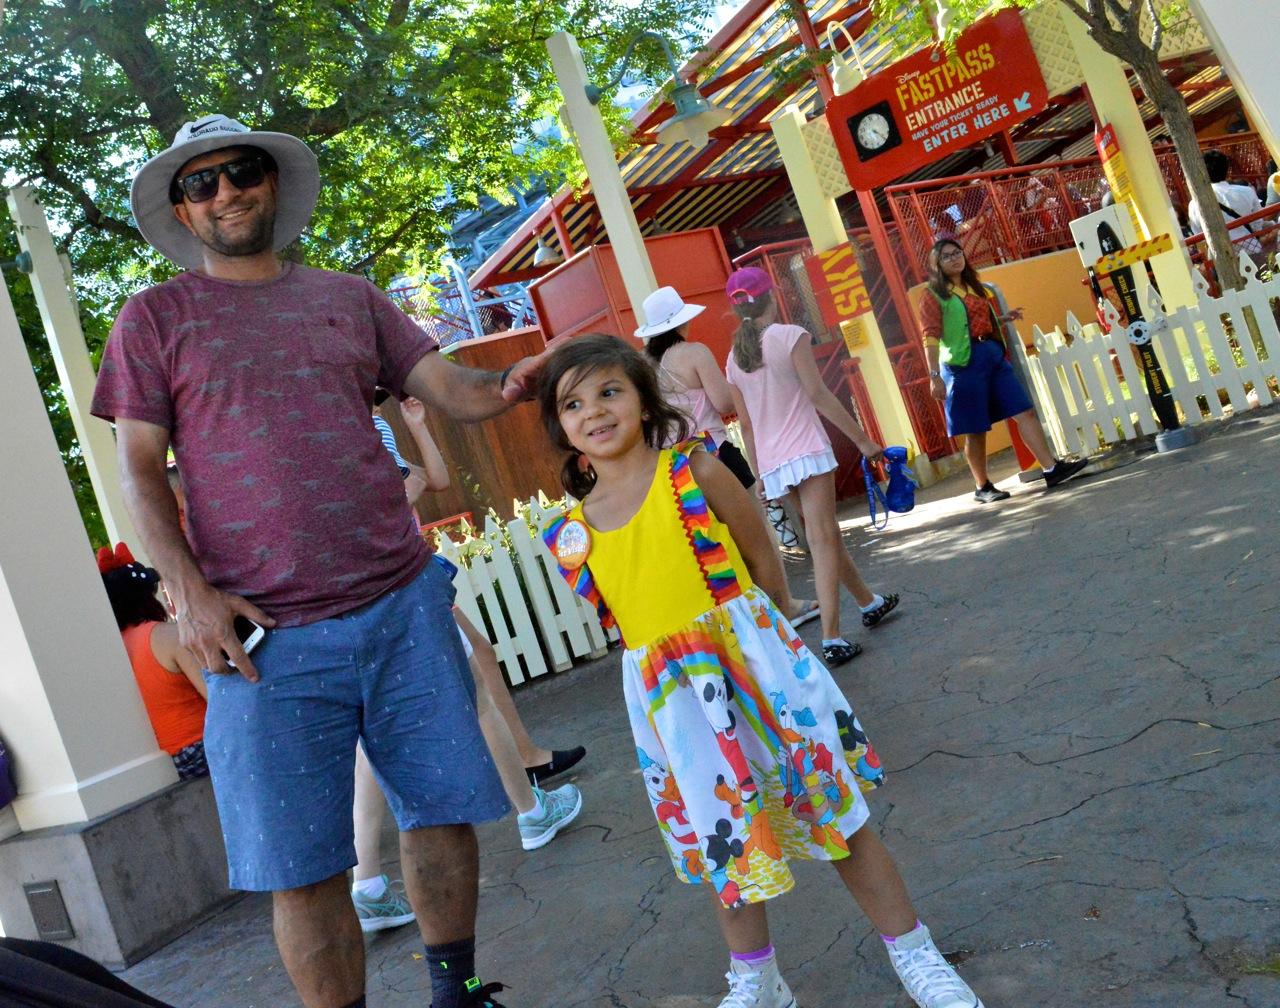 Disneyland California Adventureland with Toddlers July 2018 40.jpg